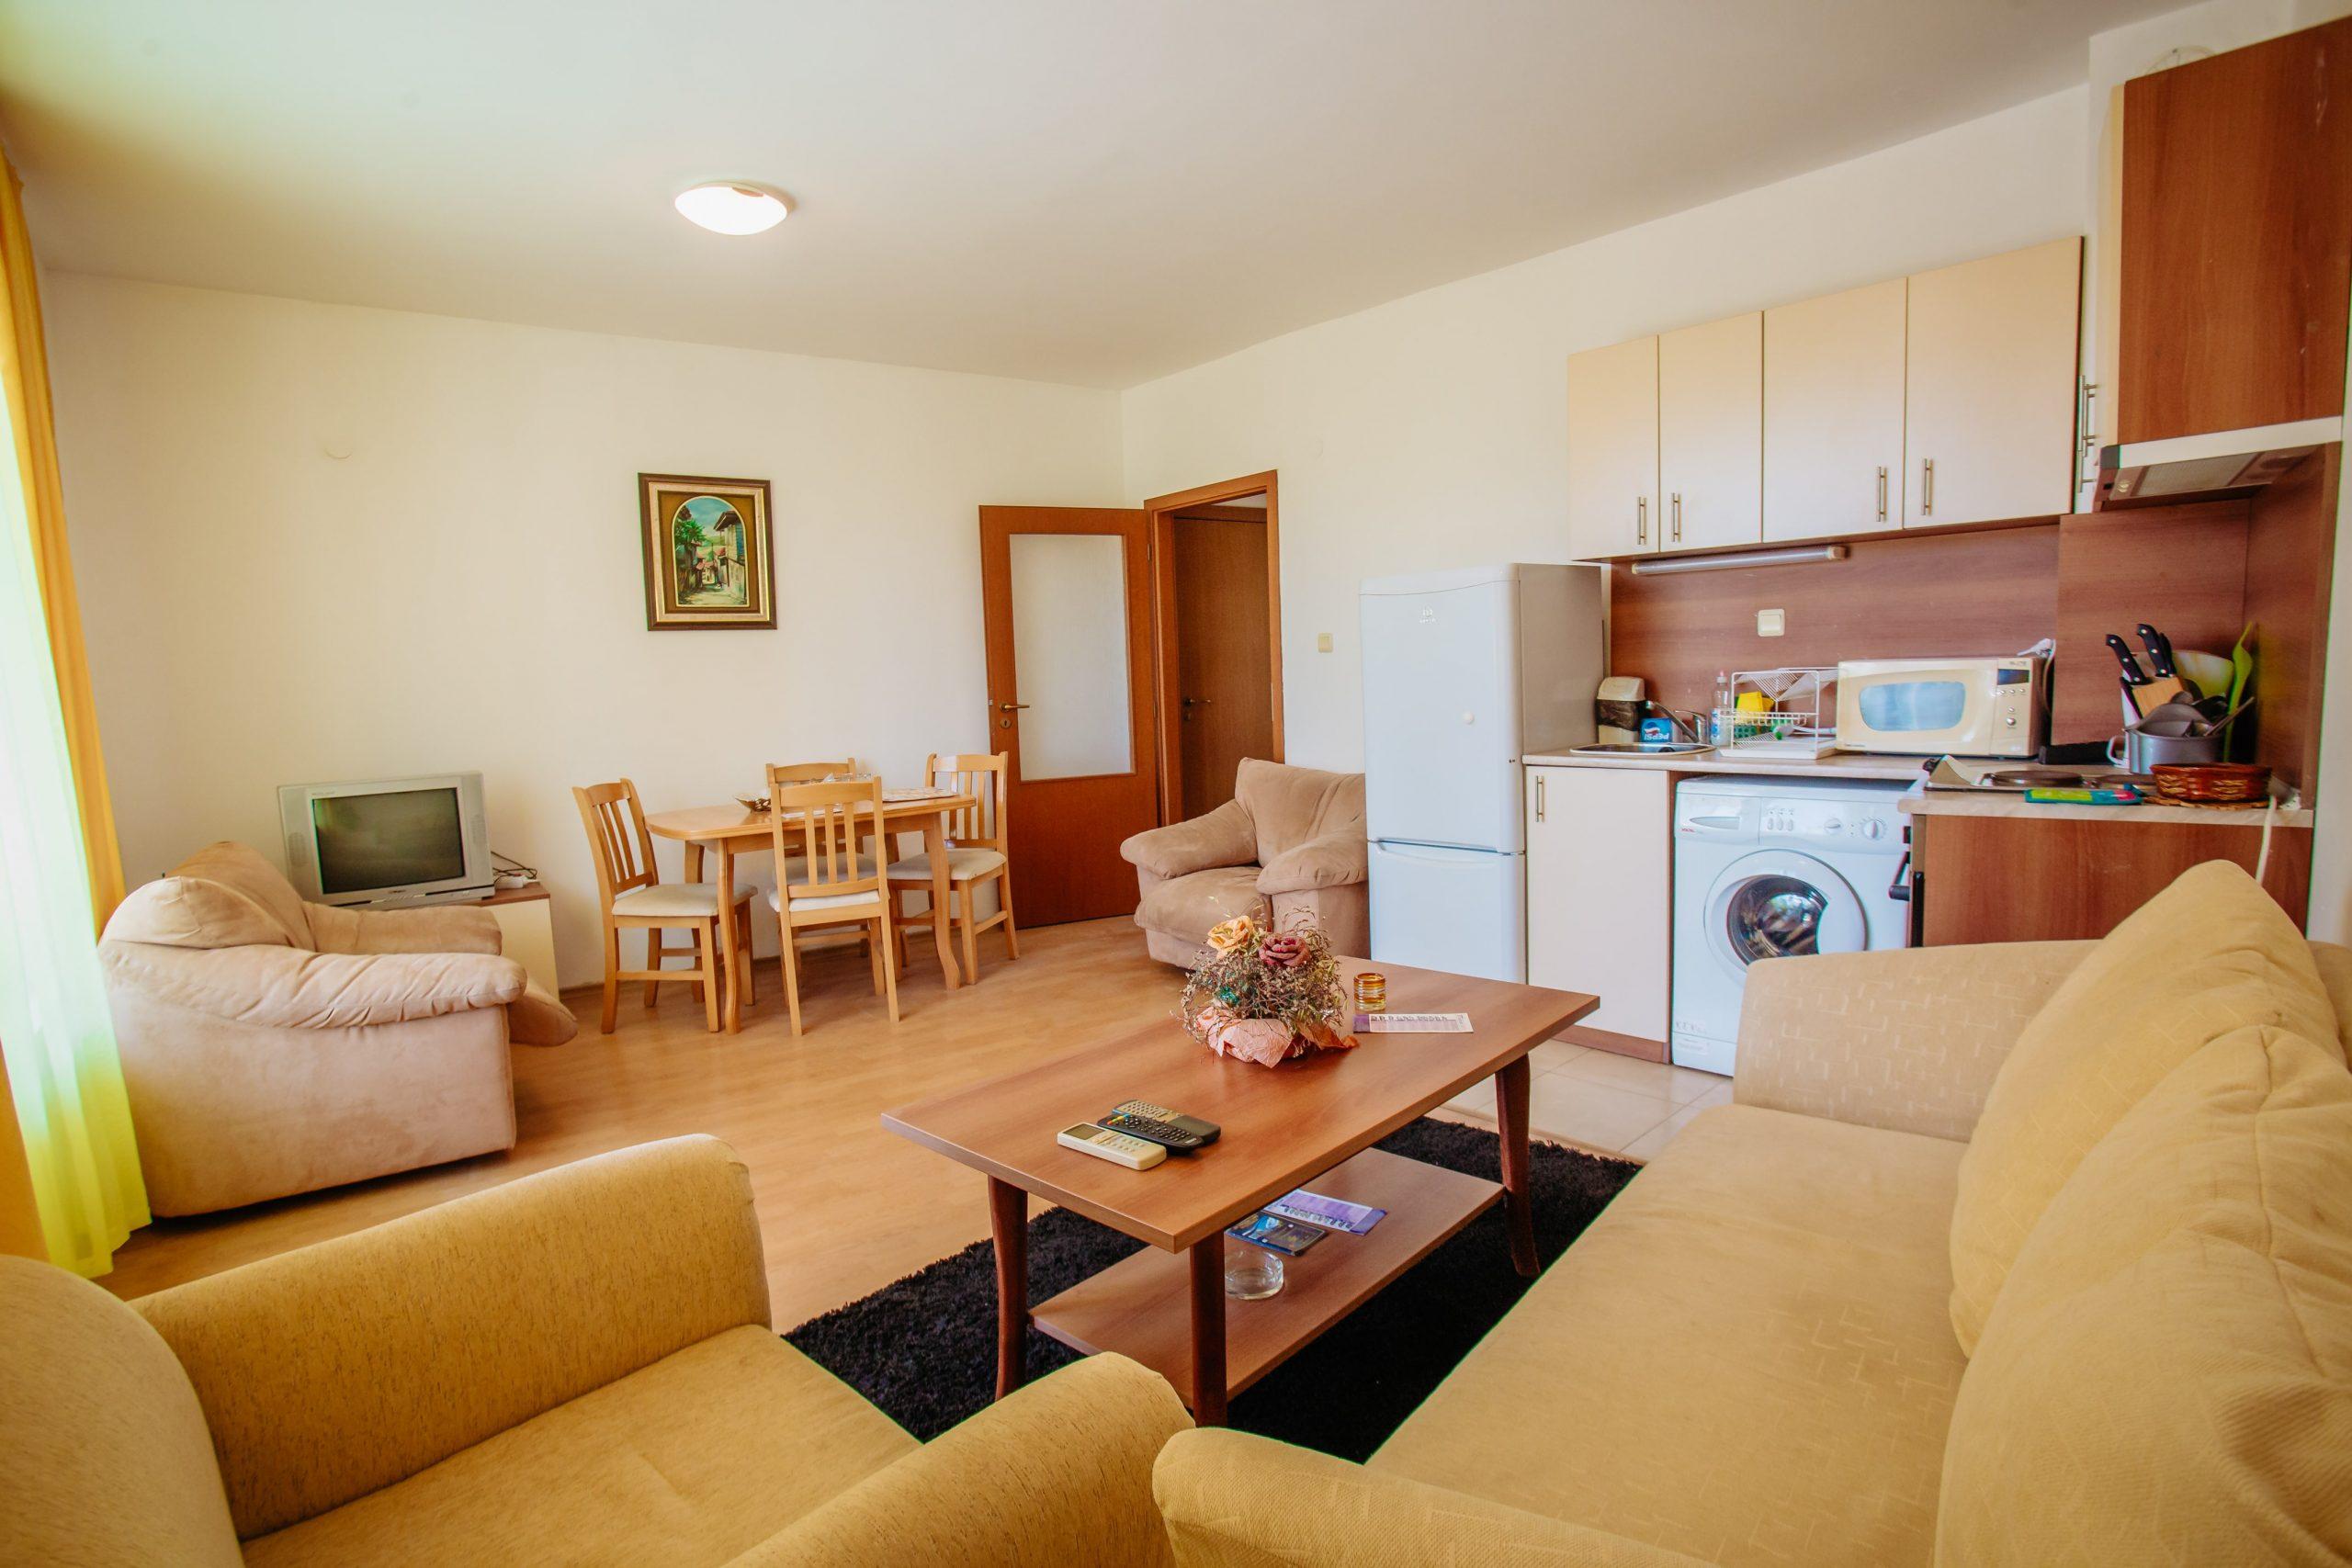 Двустаен апартамент в Слънчев бряг